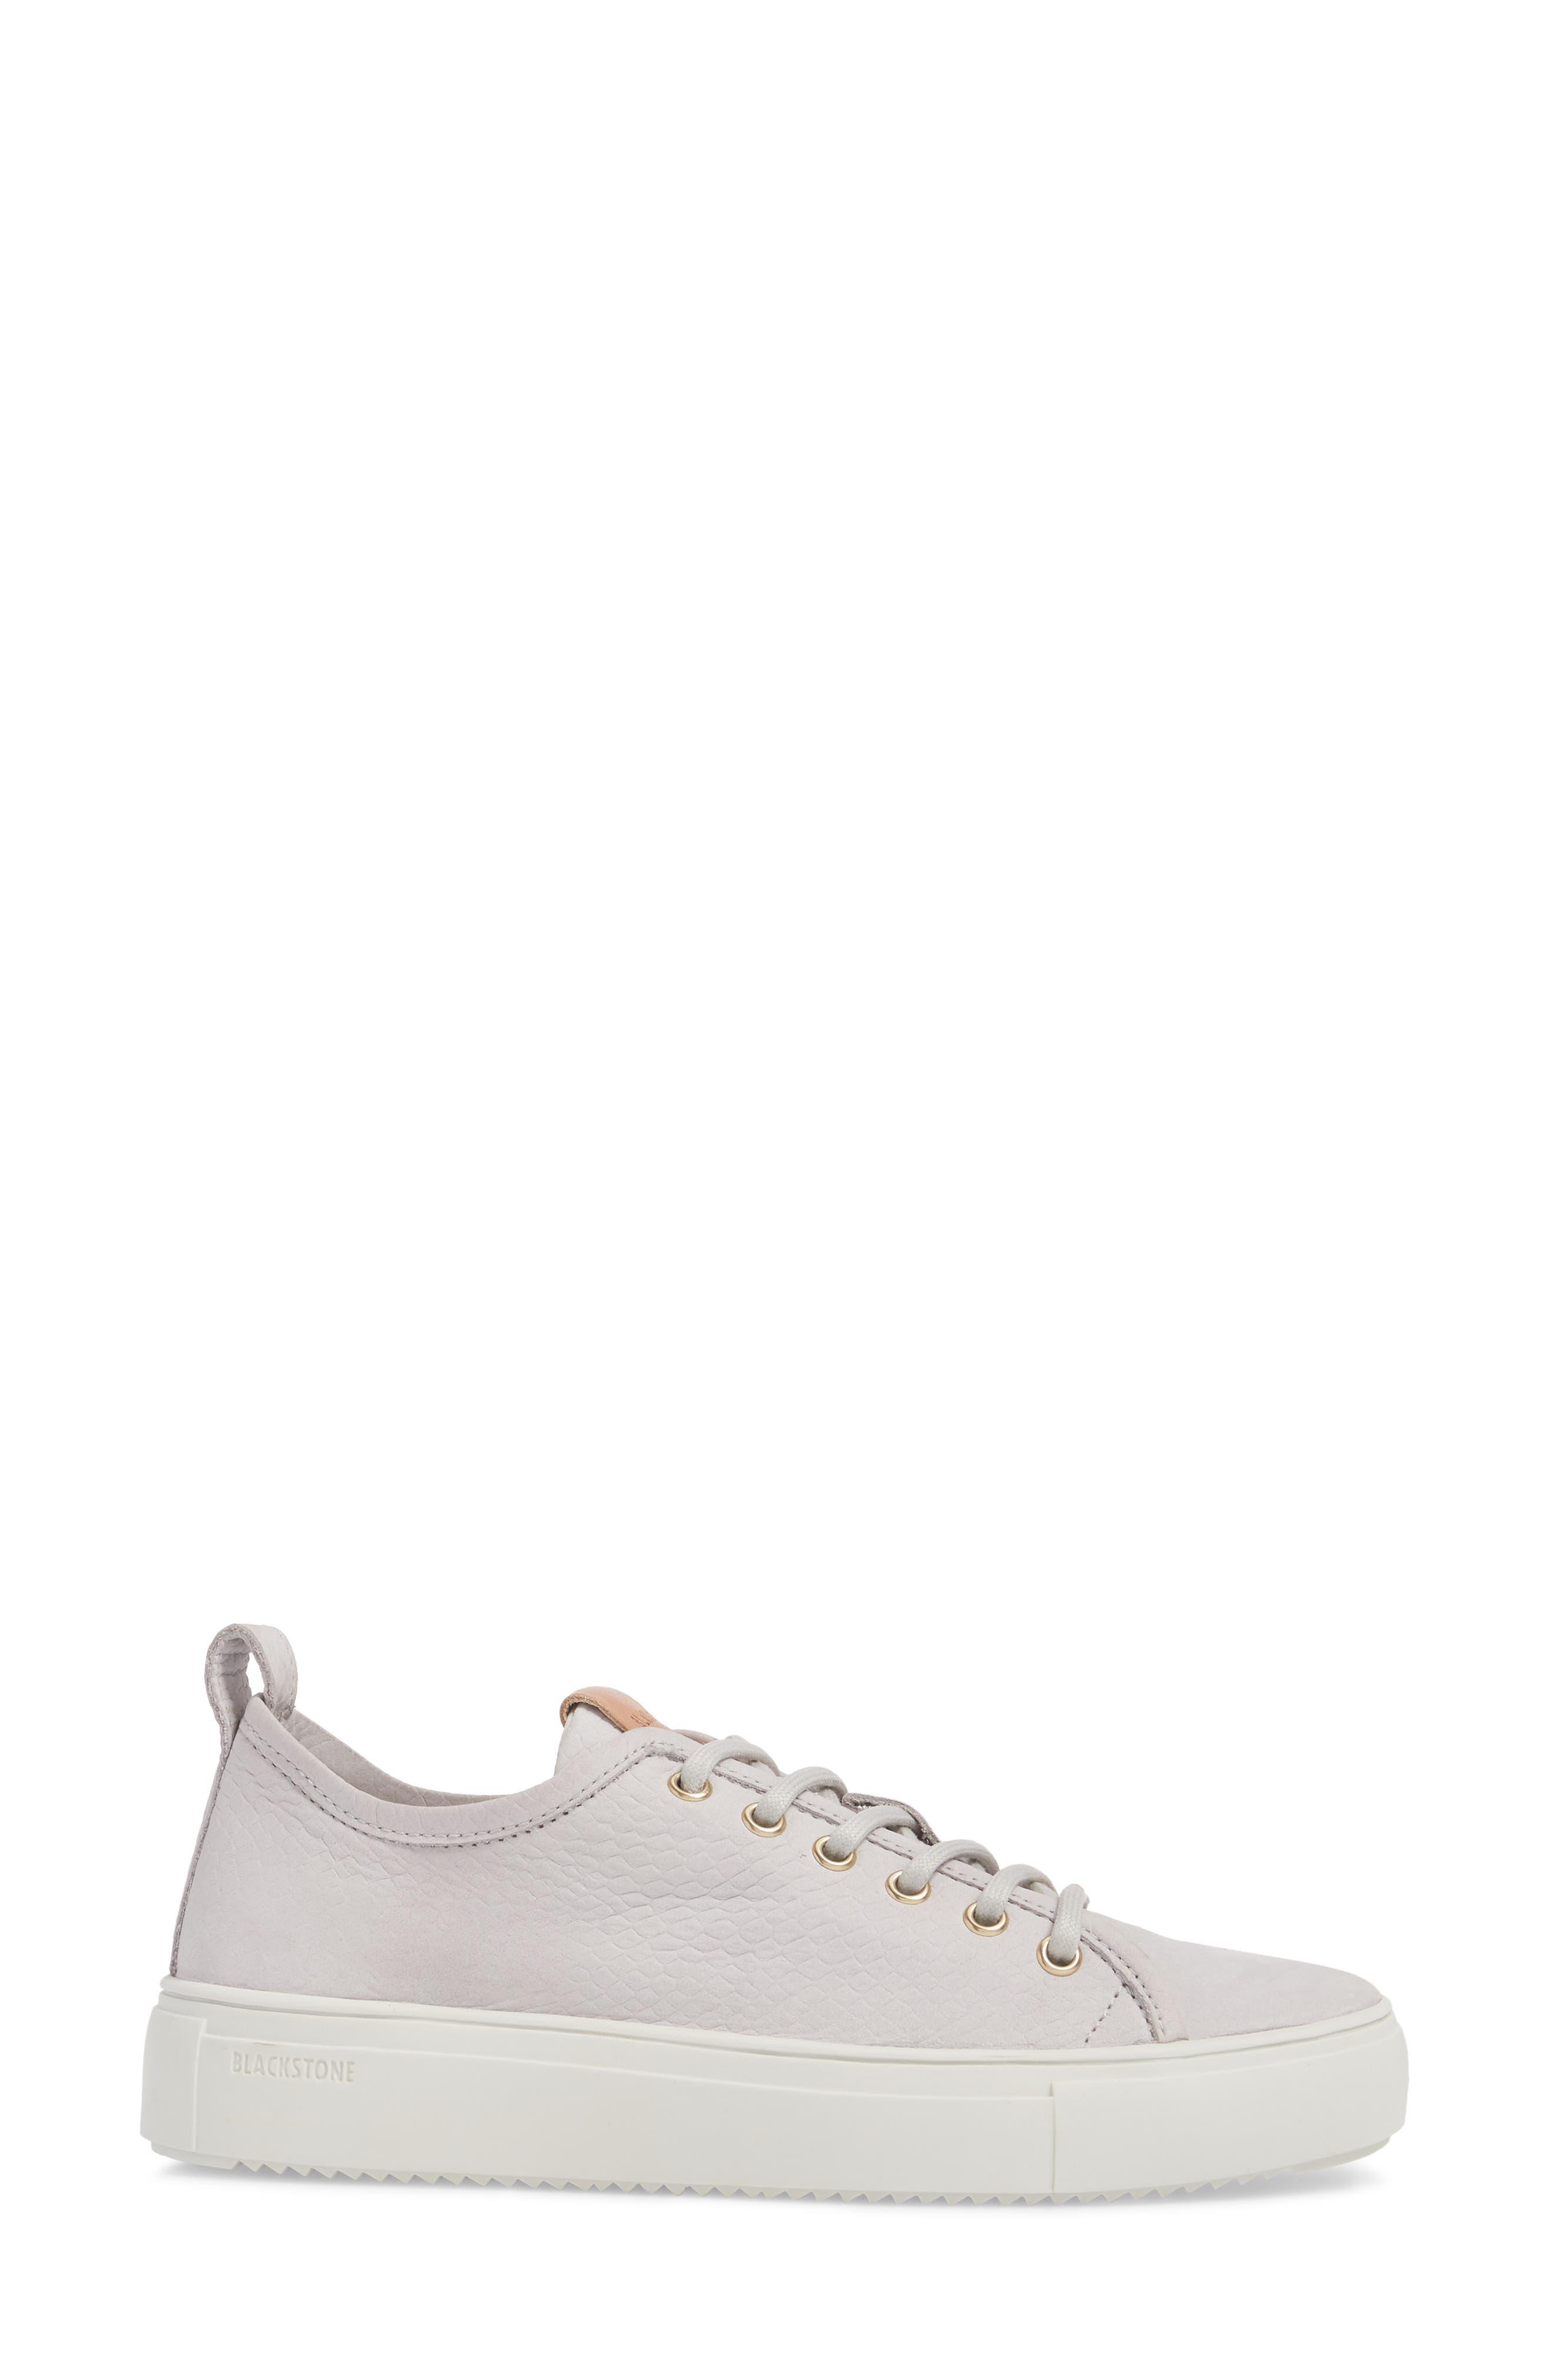 PL90 Sneaker,                             Alternate thumbnail 3, color,                             MYCRO CHIP LEATHER